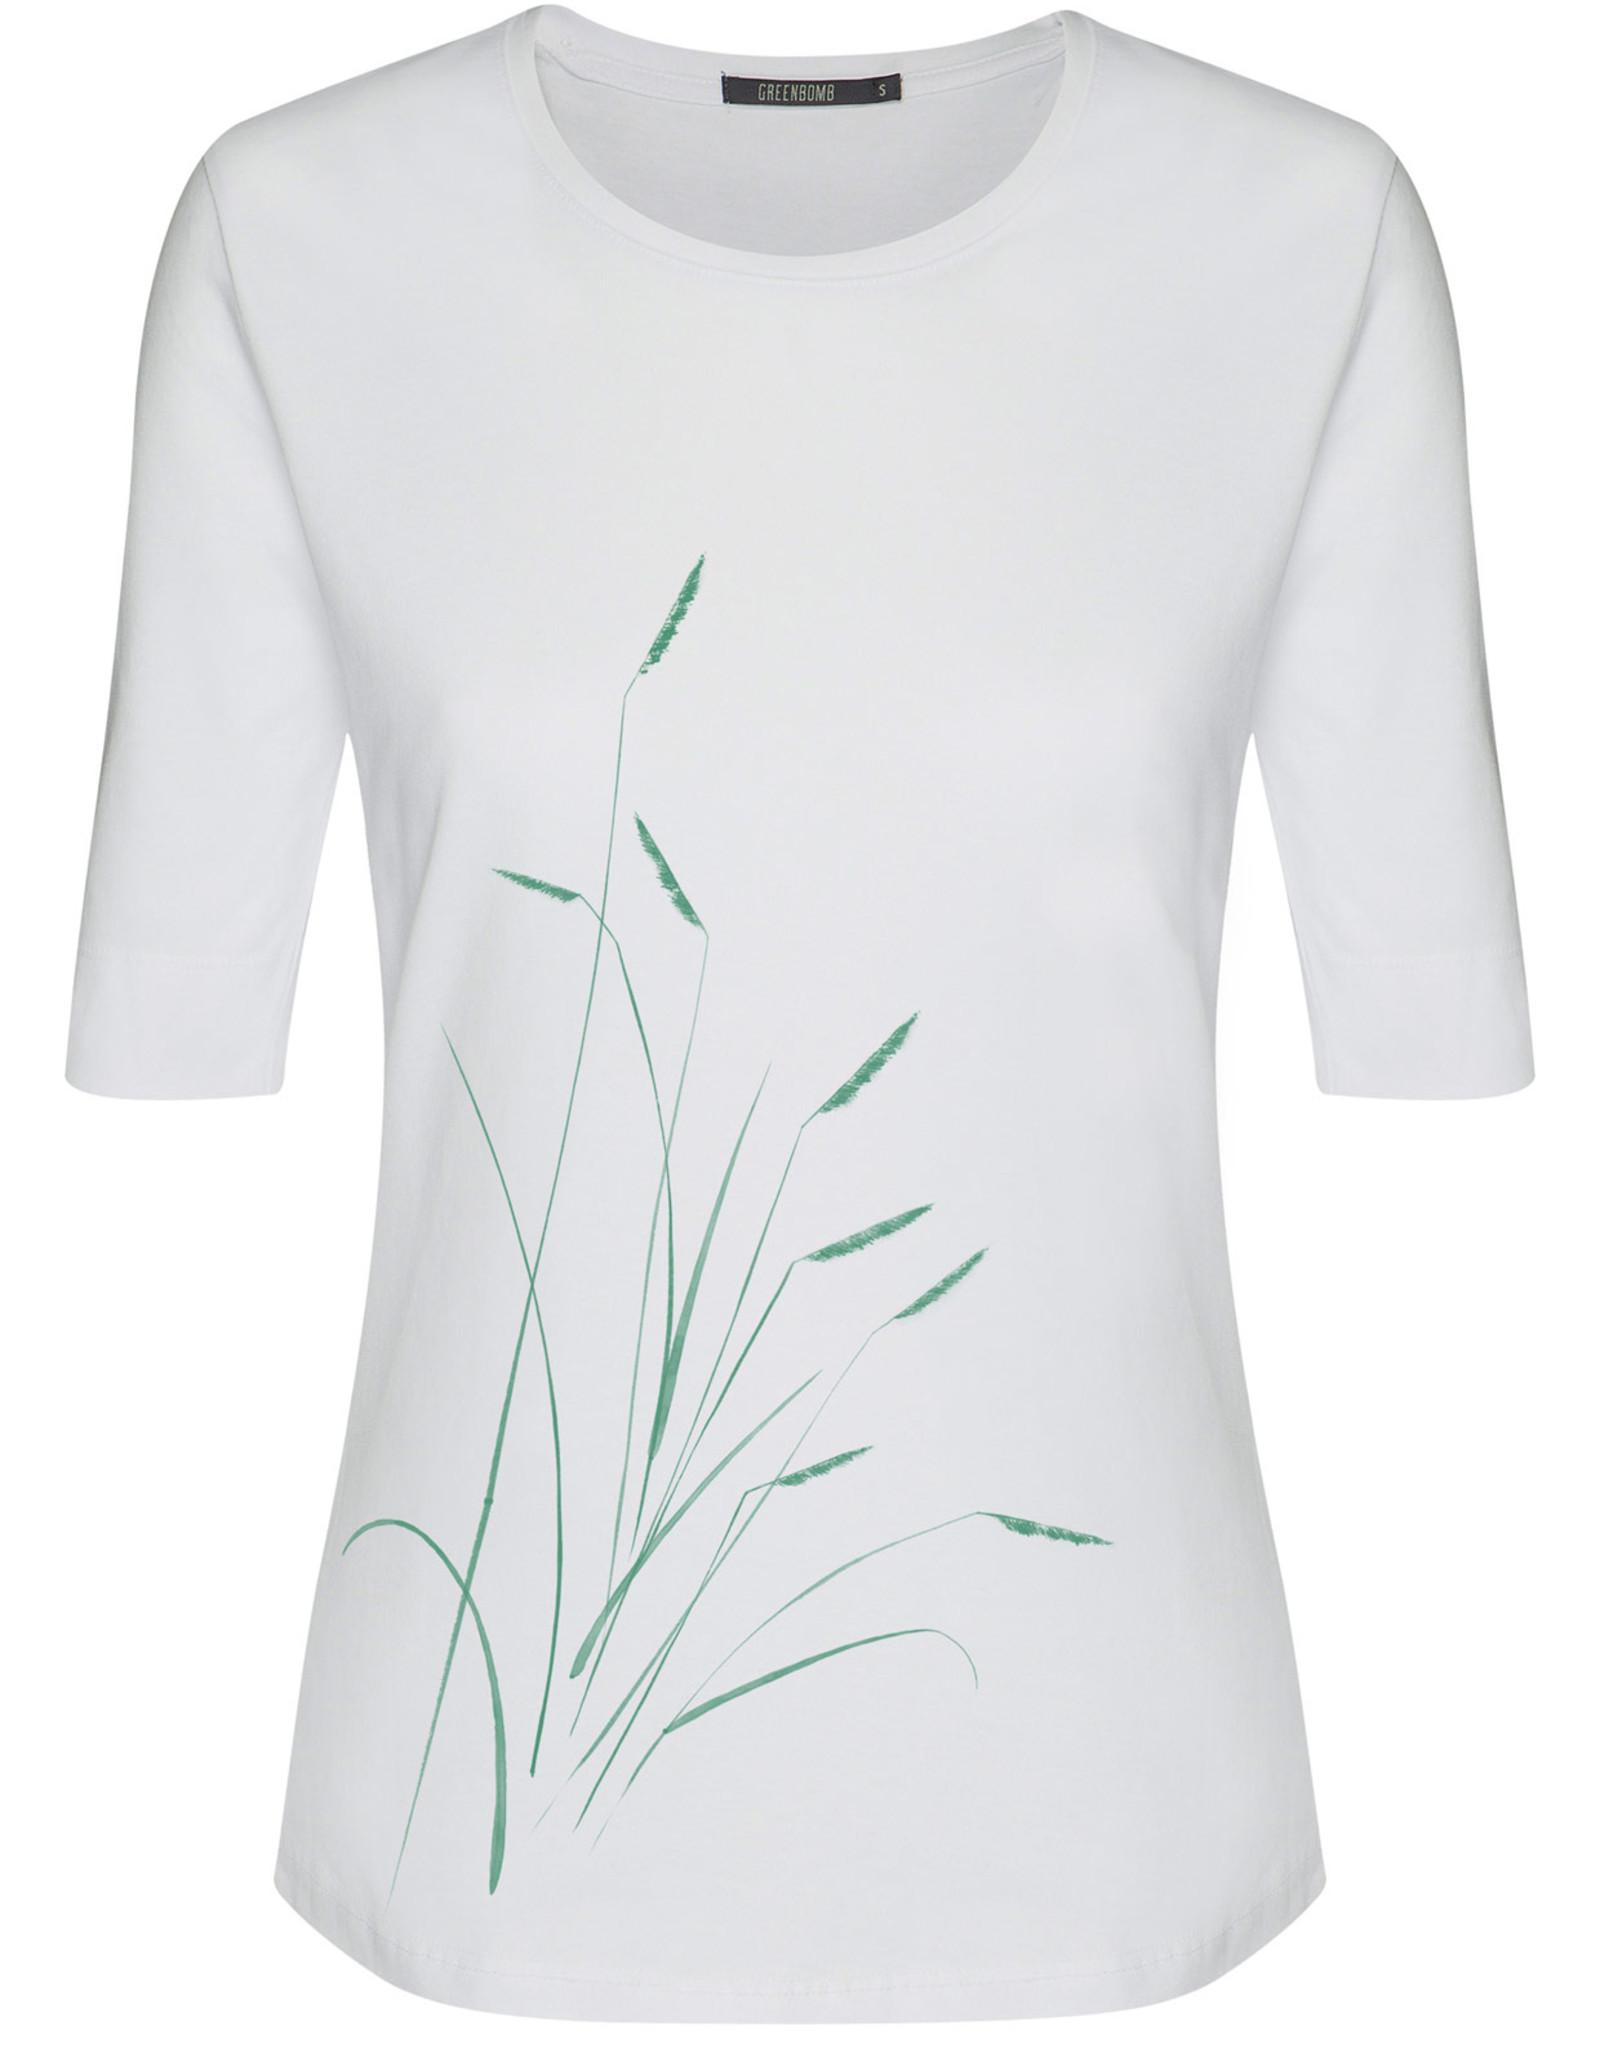 Greenbomb T-SHIRT PLANTS WHITE DEEP